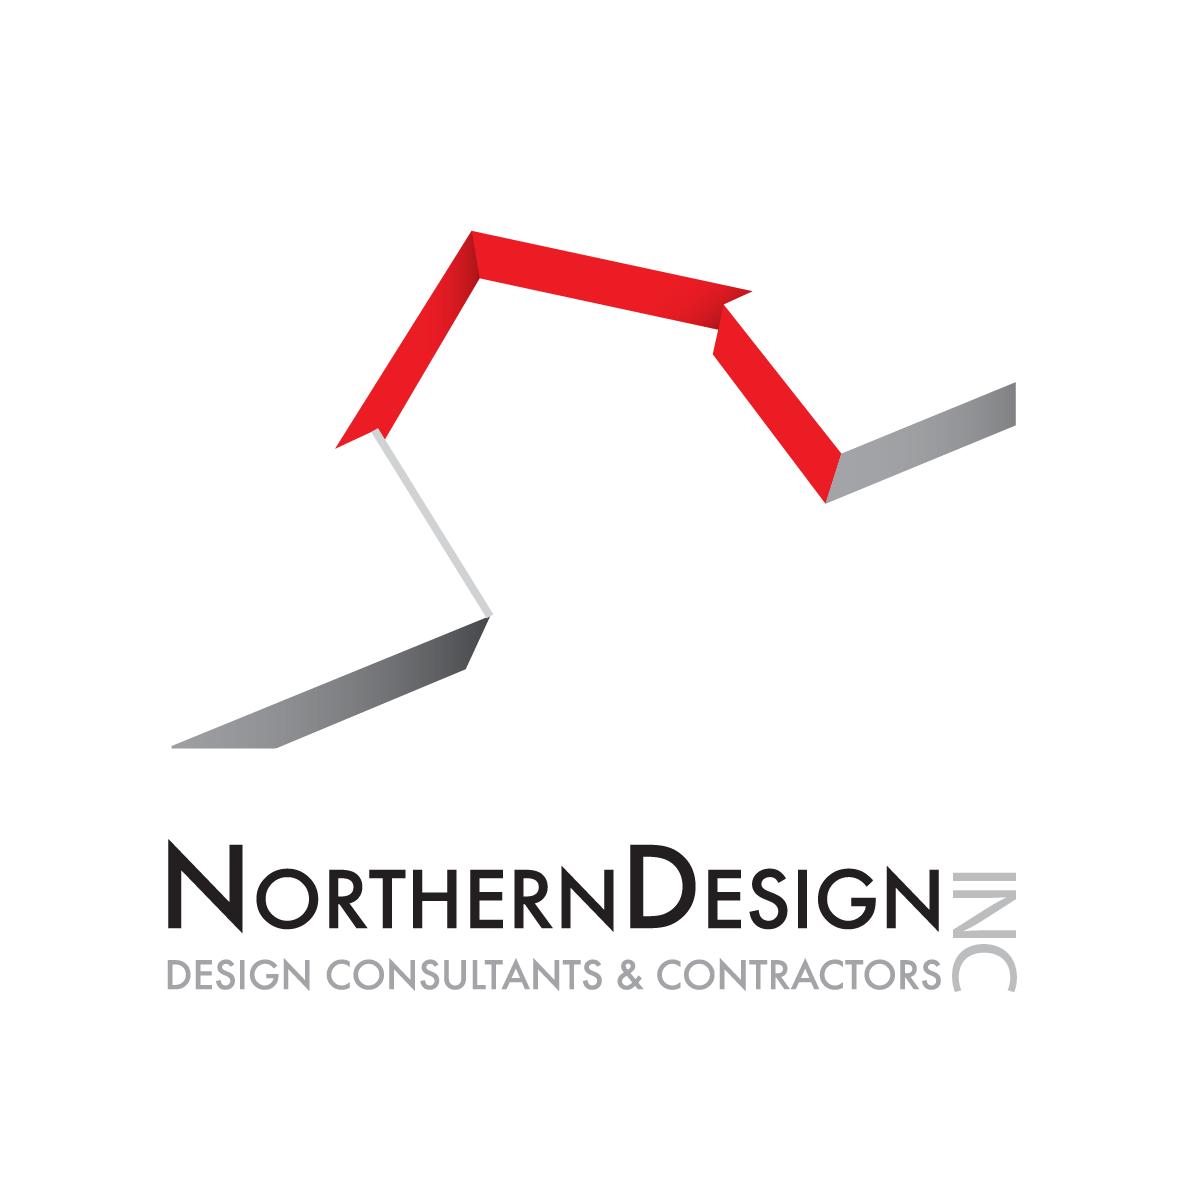 Home architecture, Interior Design & home design in Mississauga (logo concept)